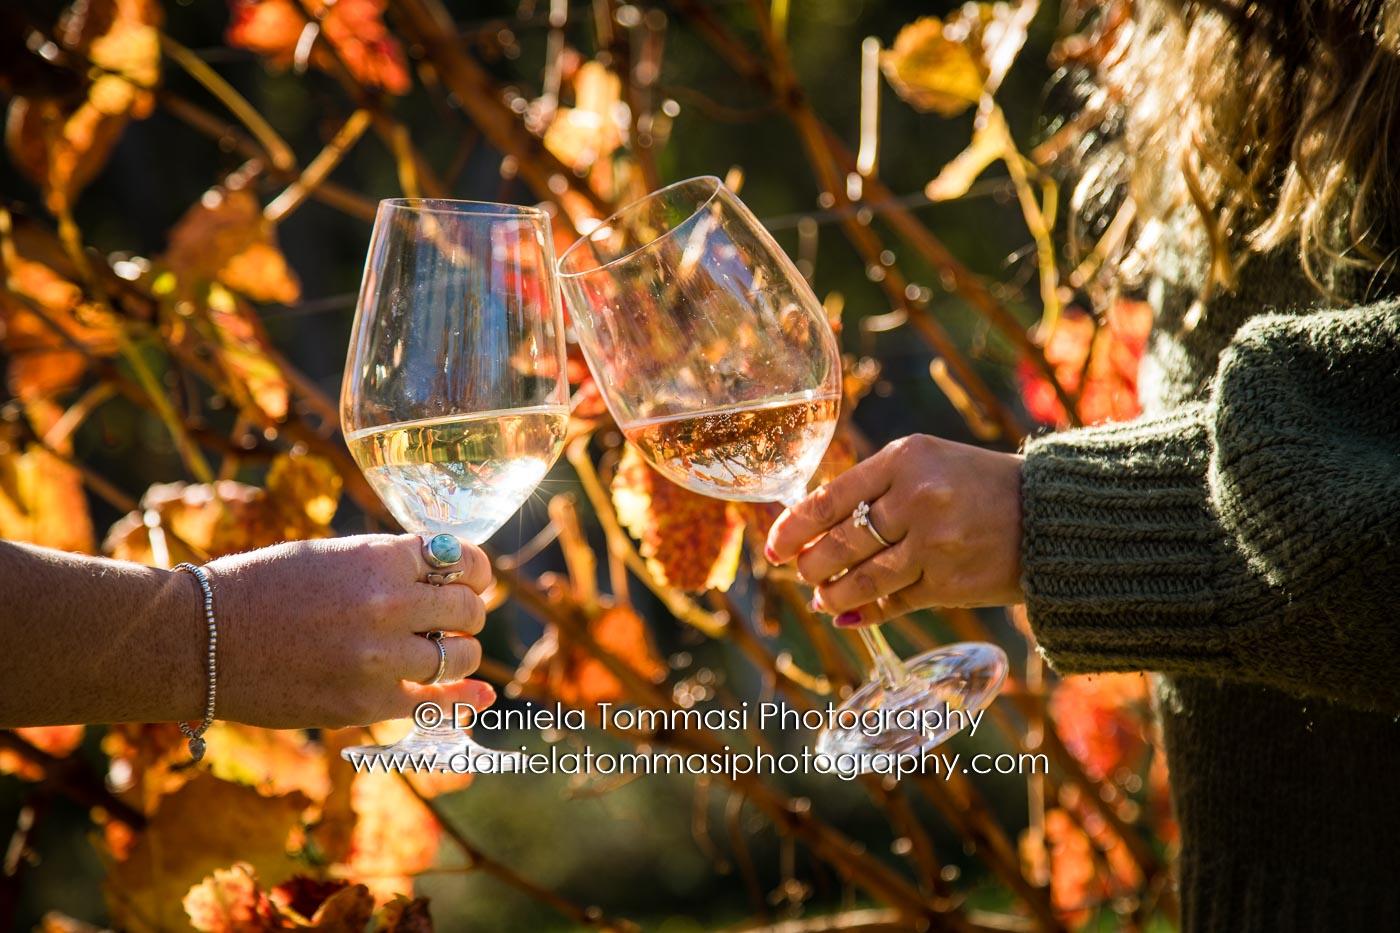 Winery-Daniela Tommasi Photography-7